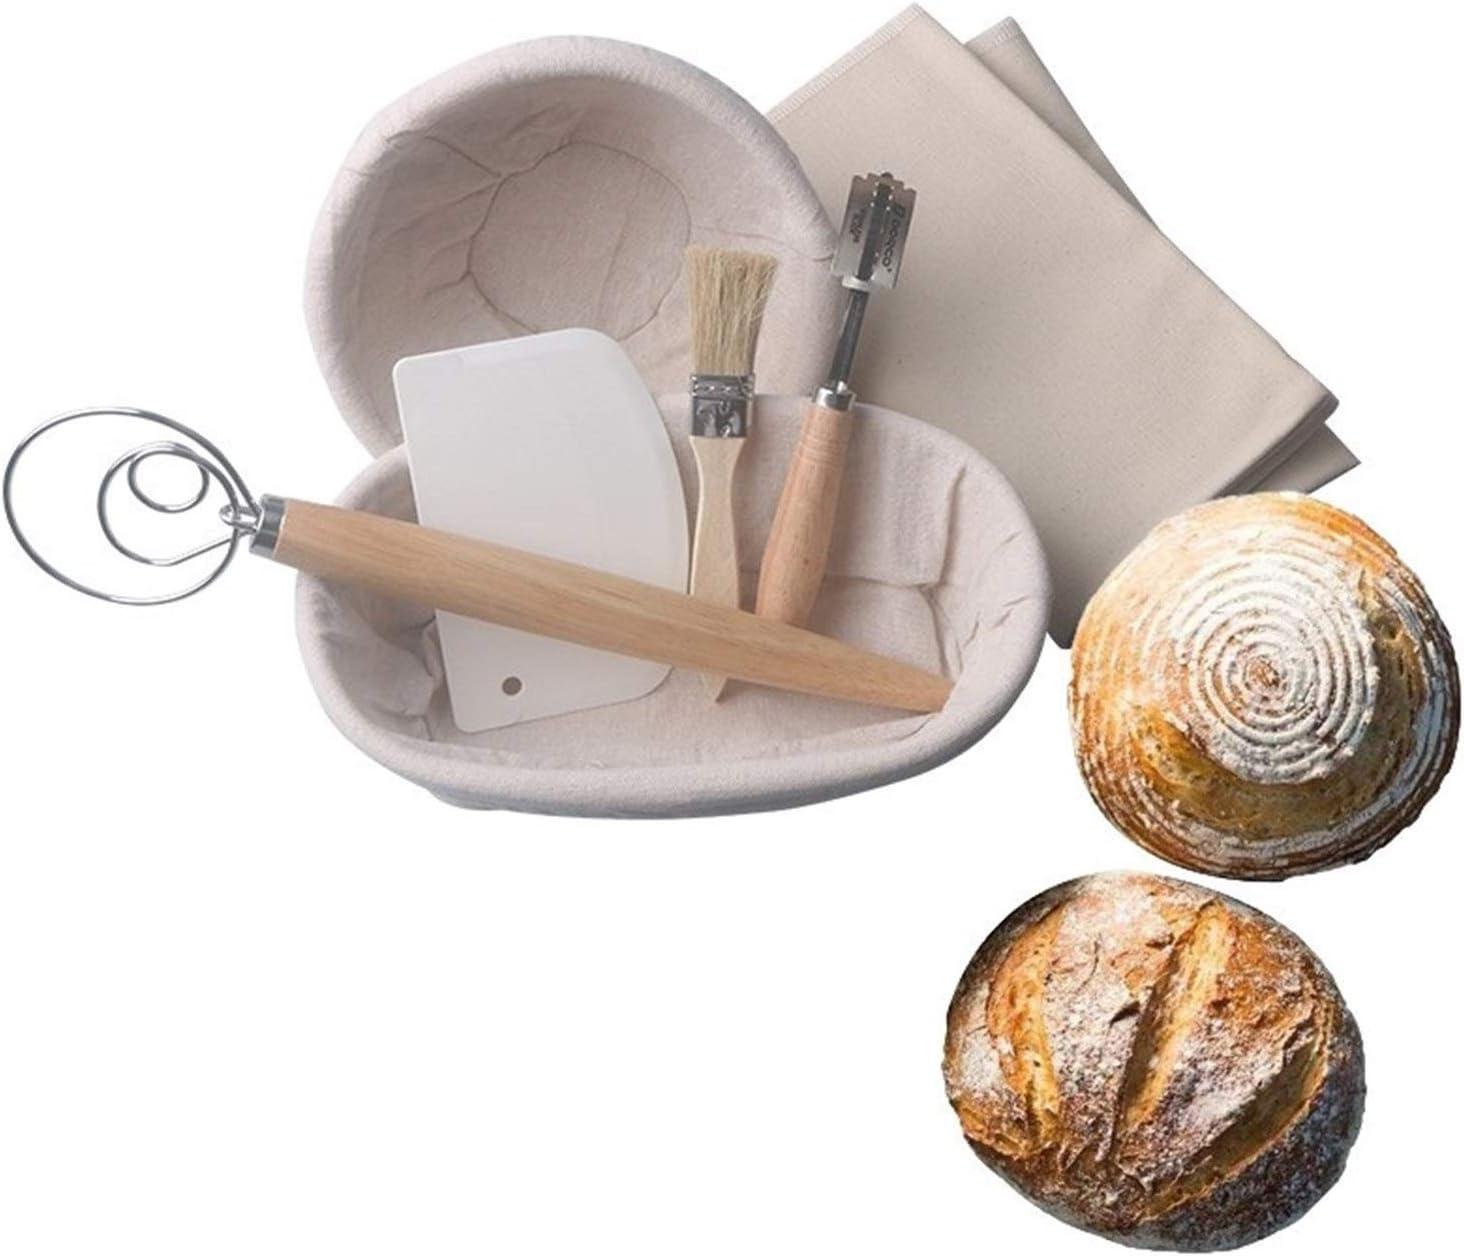 YWSZY Bread Proofing Baskets Dough Max 66% OFF Max 59% OFF Fermentation Rattan 7P Basket